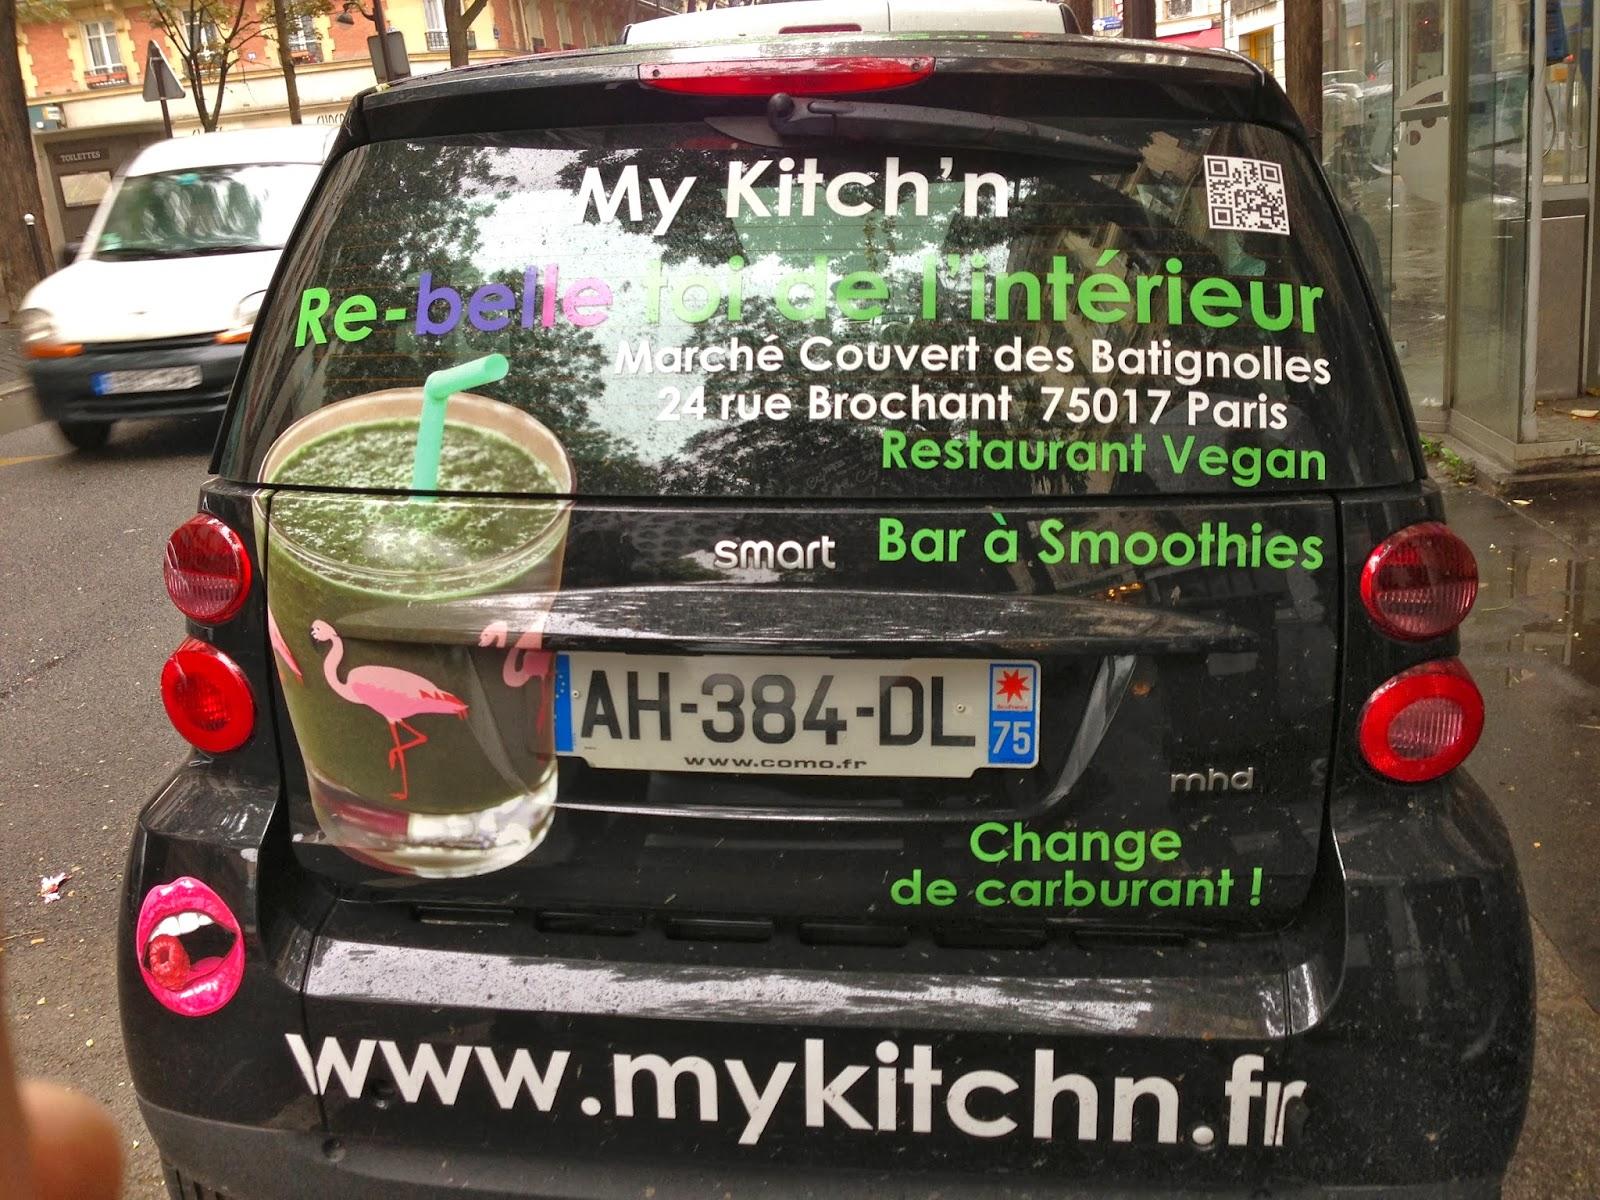 www.mykitchn.fr